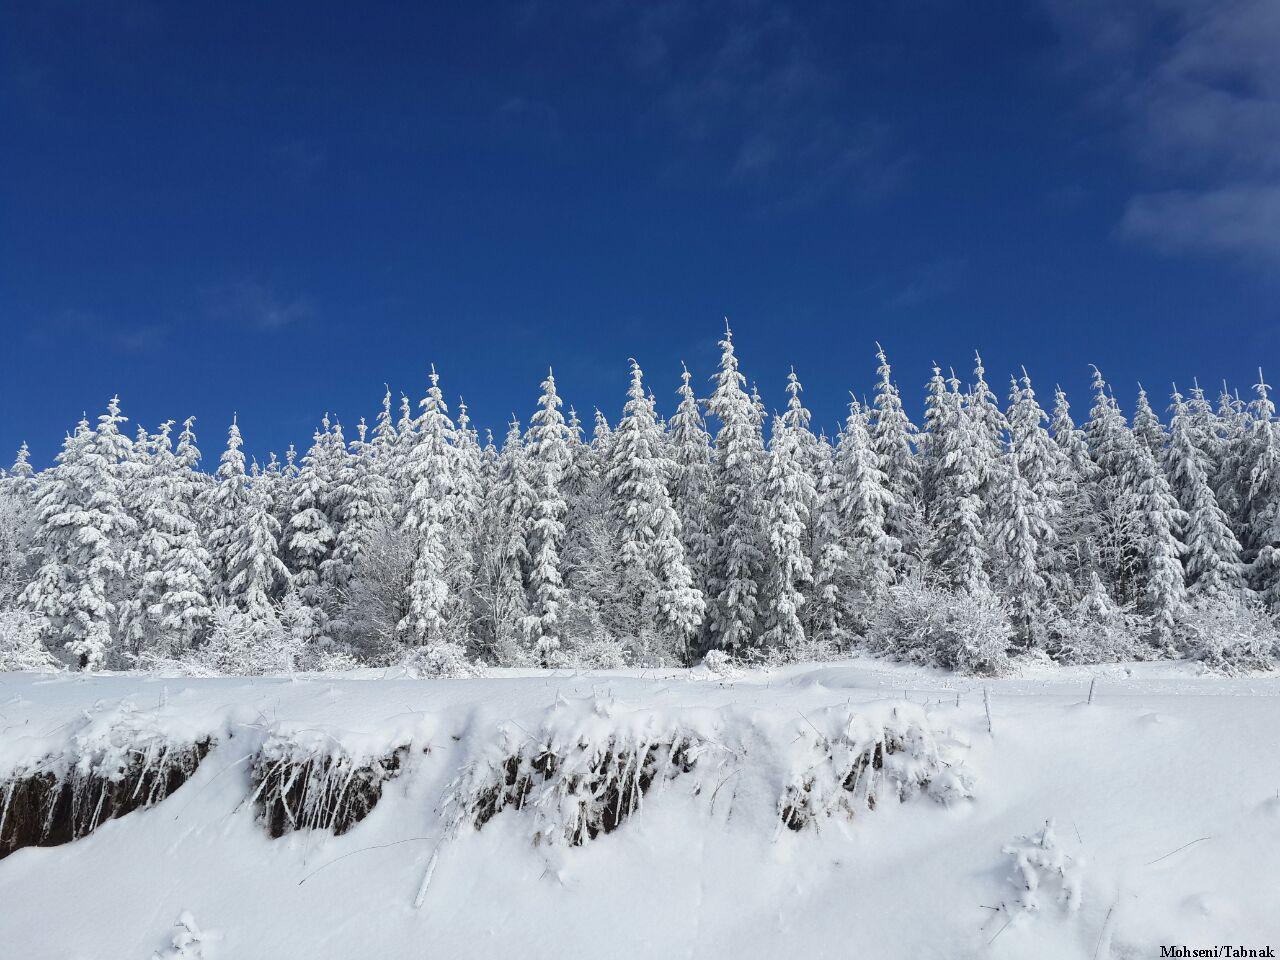 جنگل توسکا چشمه گلوگاه ,مازندران